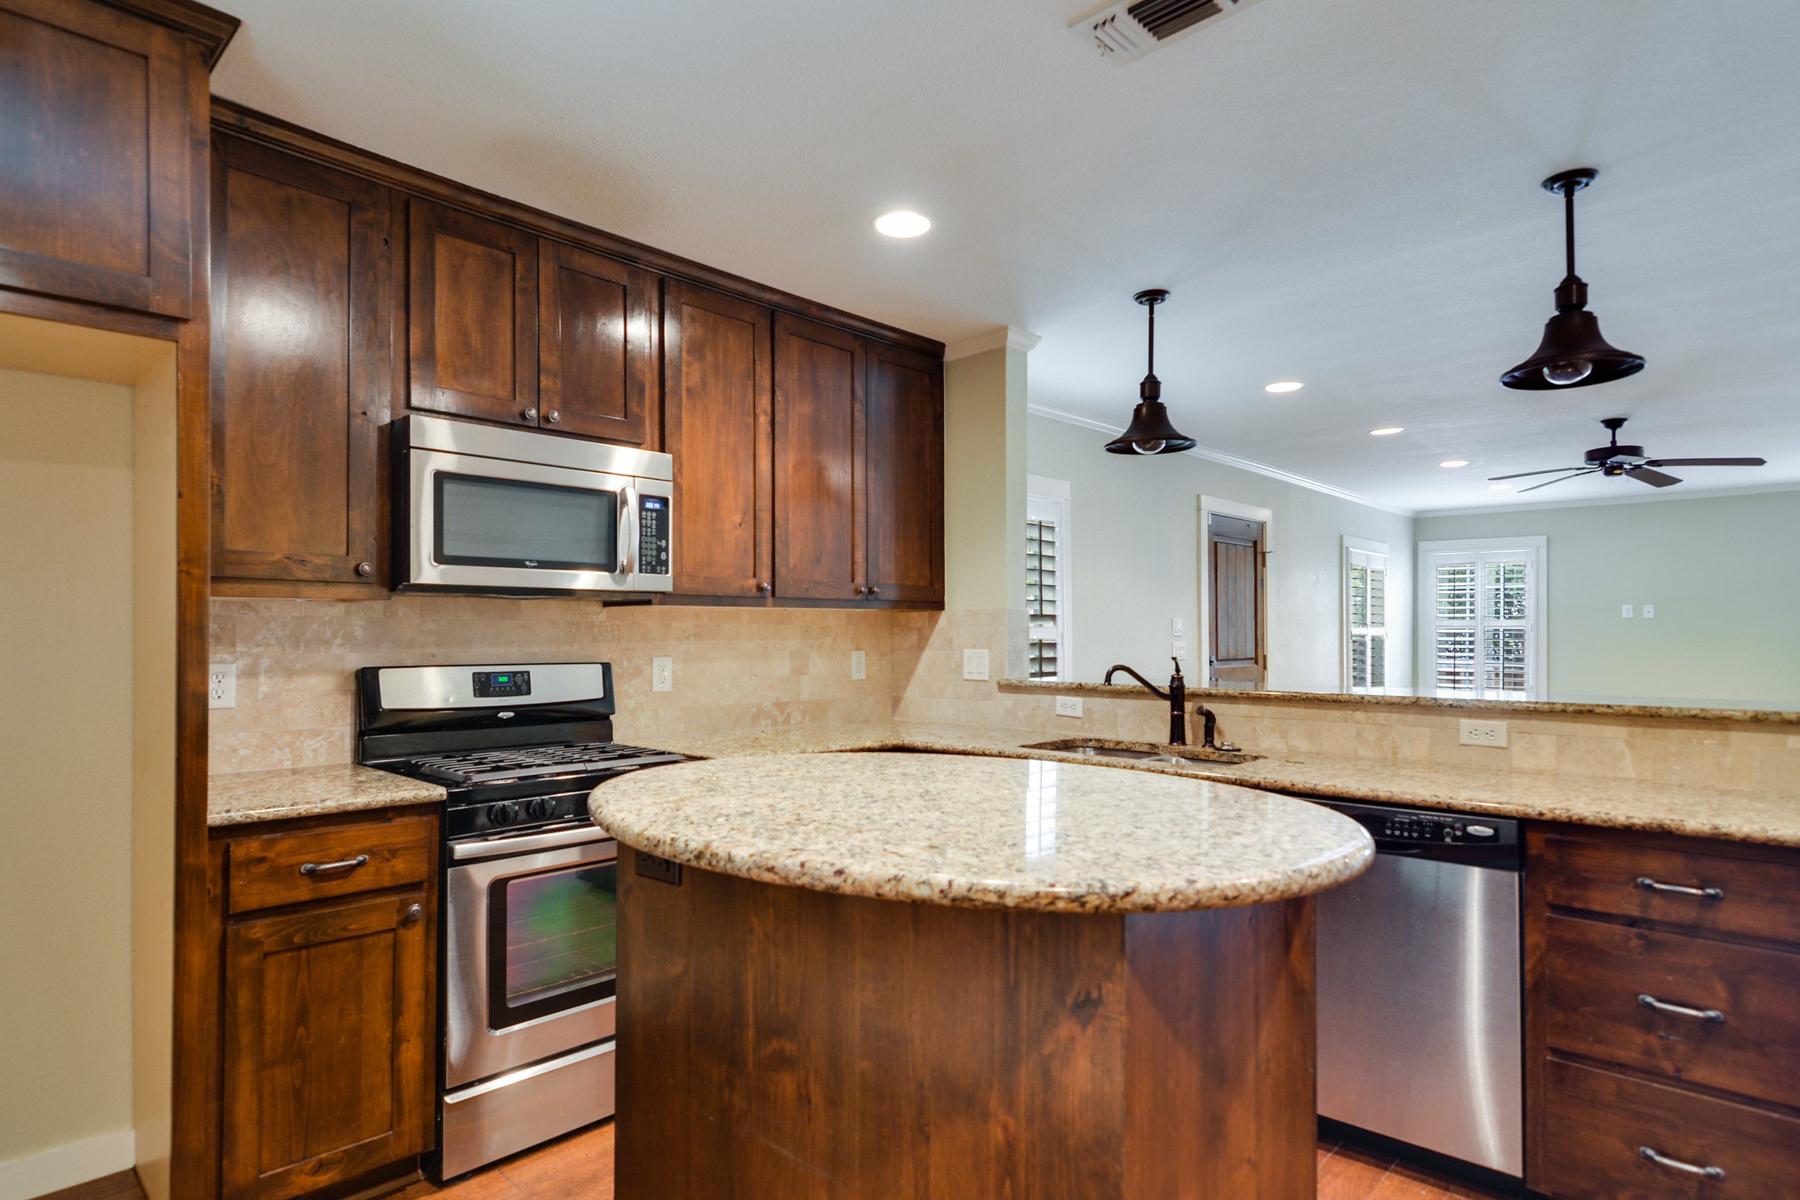 Additional photo for property listing at Charming Home in Alamo Heights 280 E Fair Oaks Pl San Antonio, Texas 78209 Estados Unidos